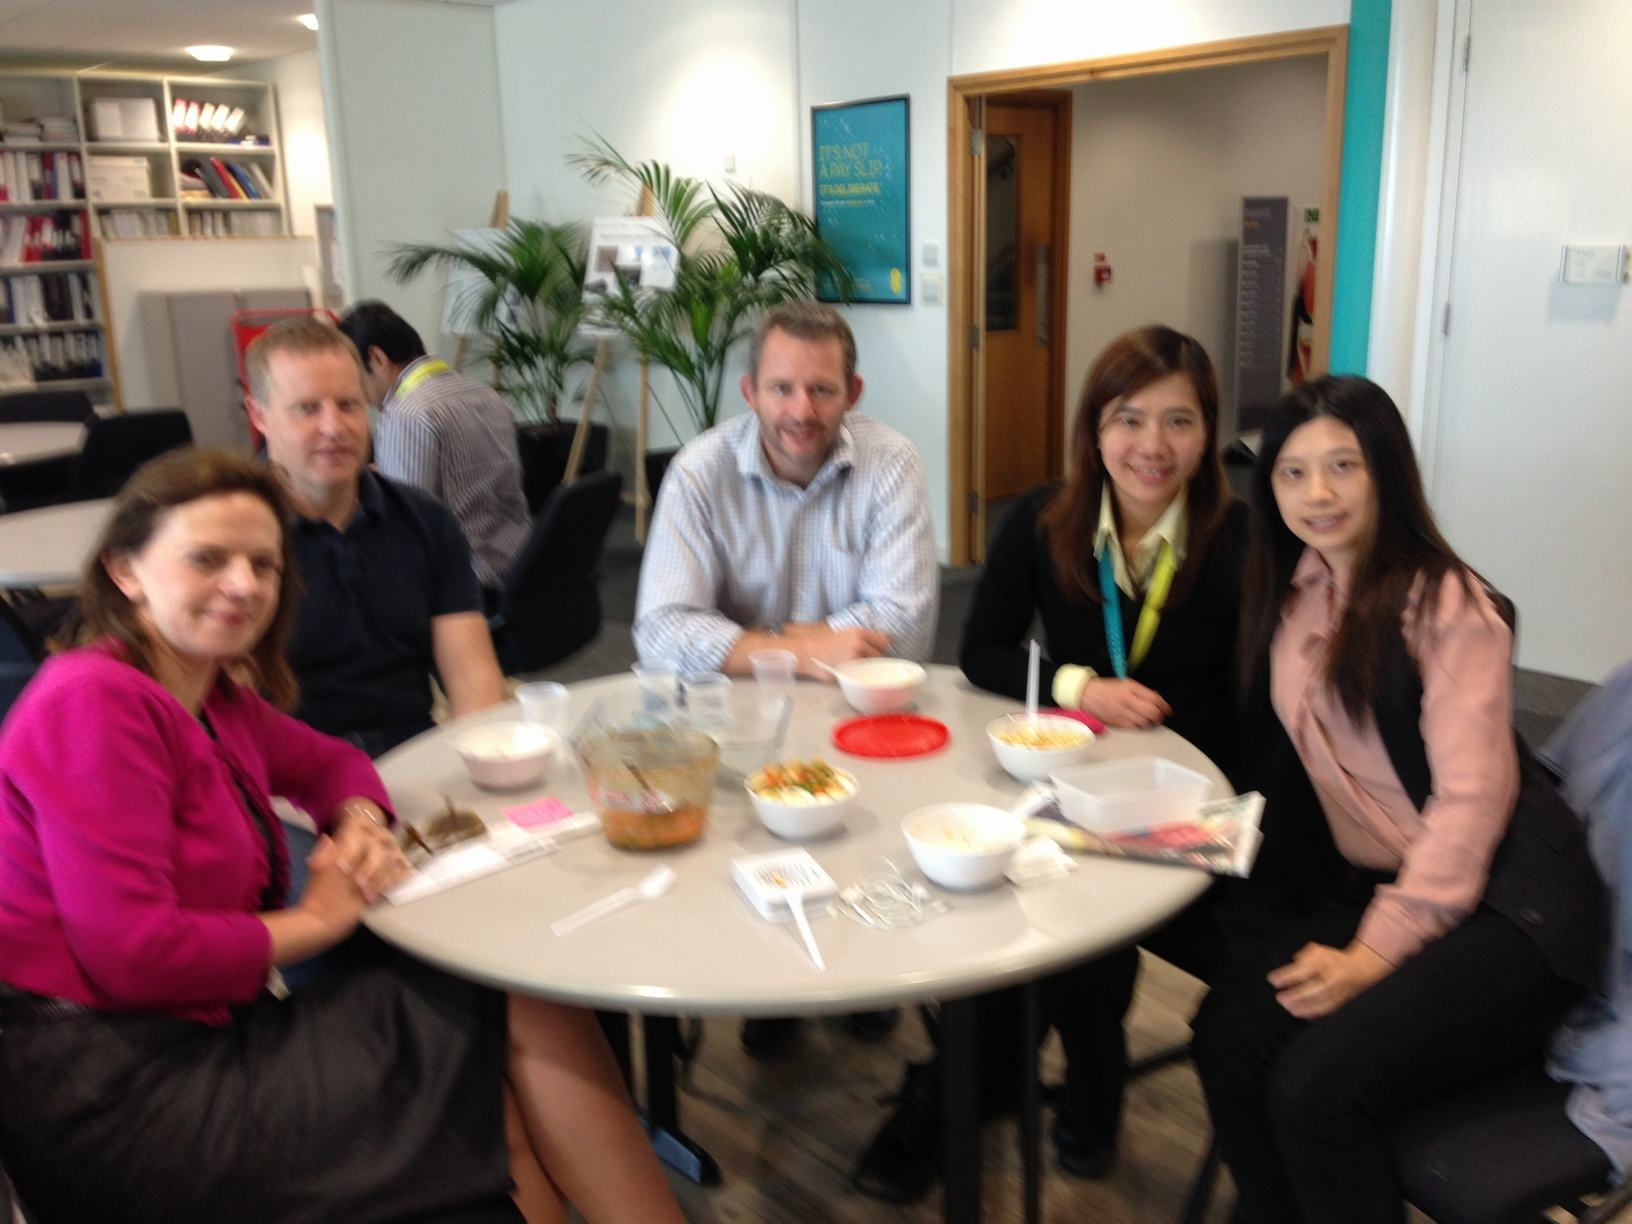 Introducing the Team: Jane, Dylan, Lou, Ai Seok & Vivian